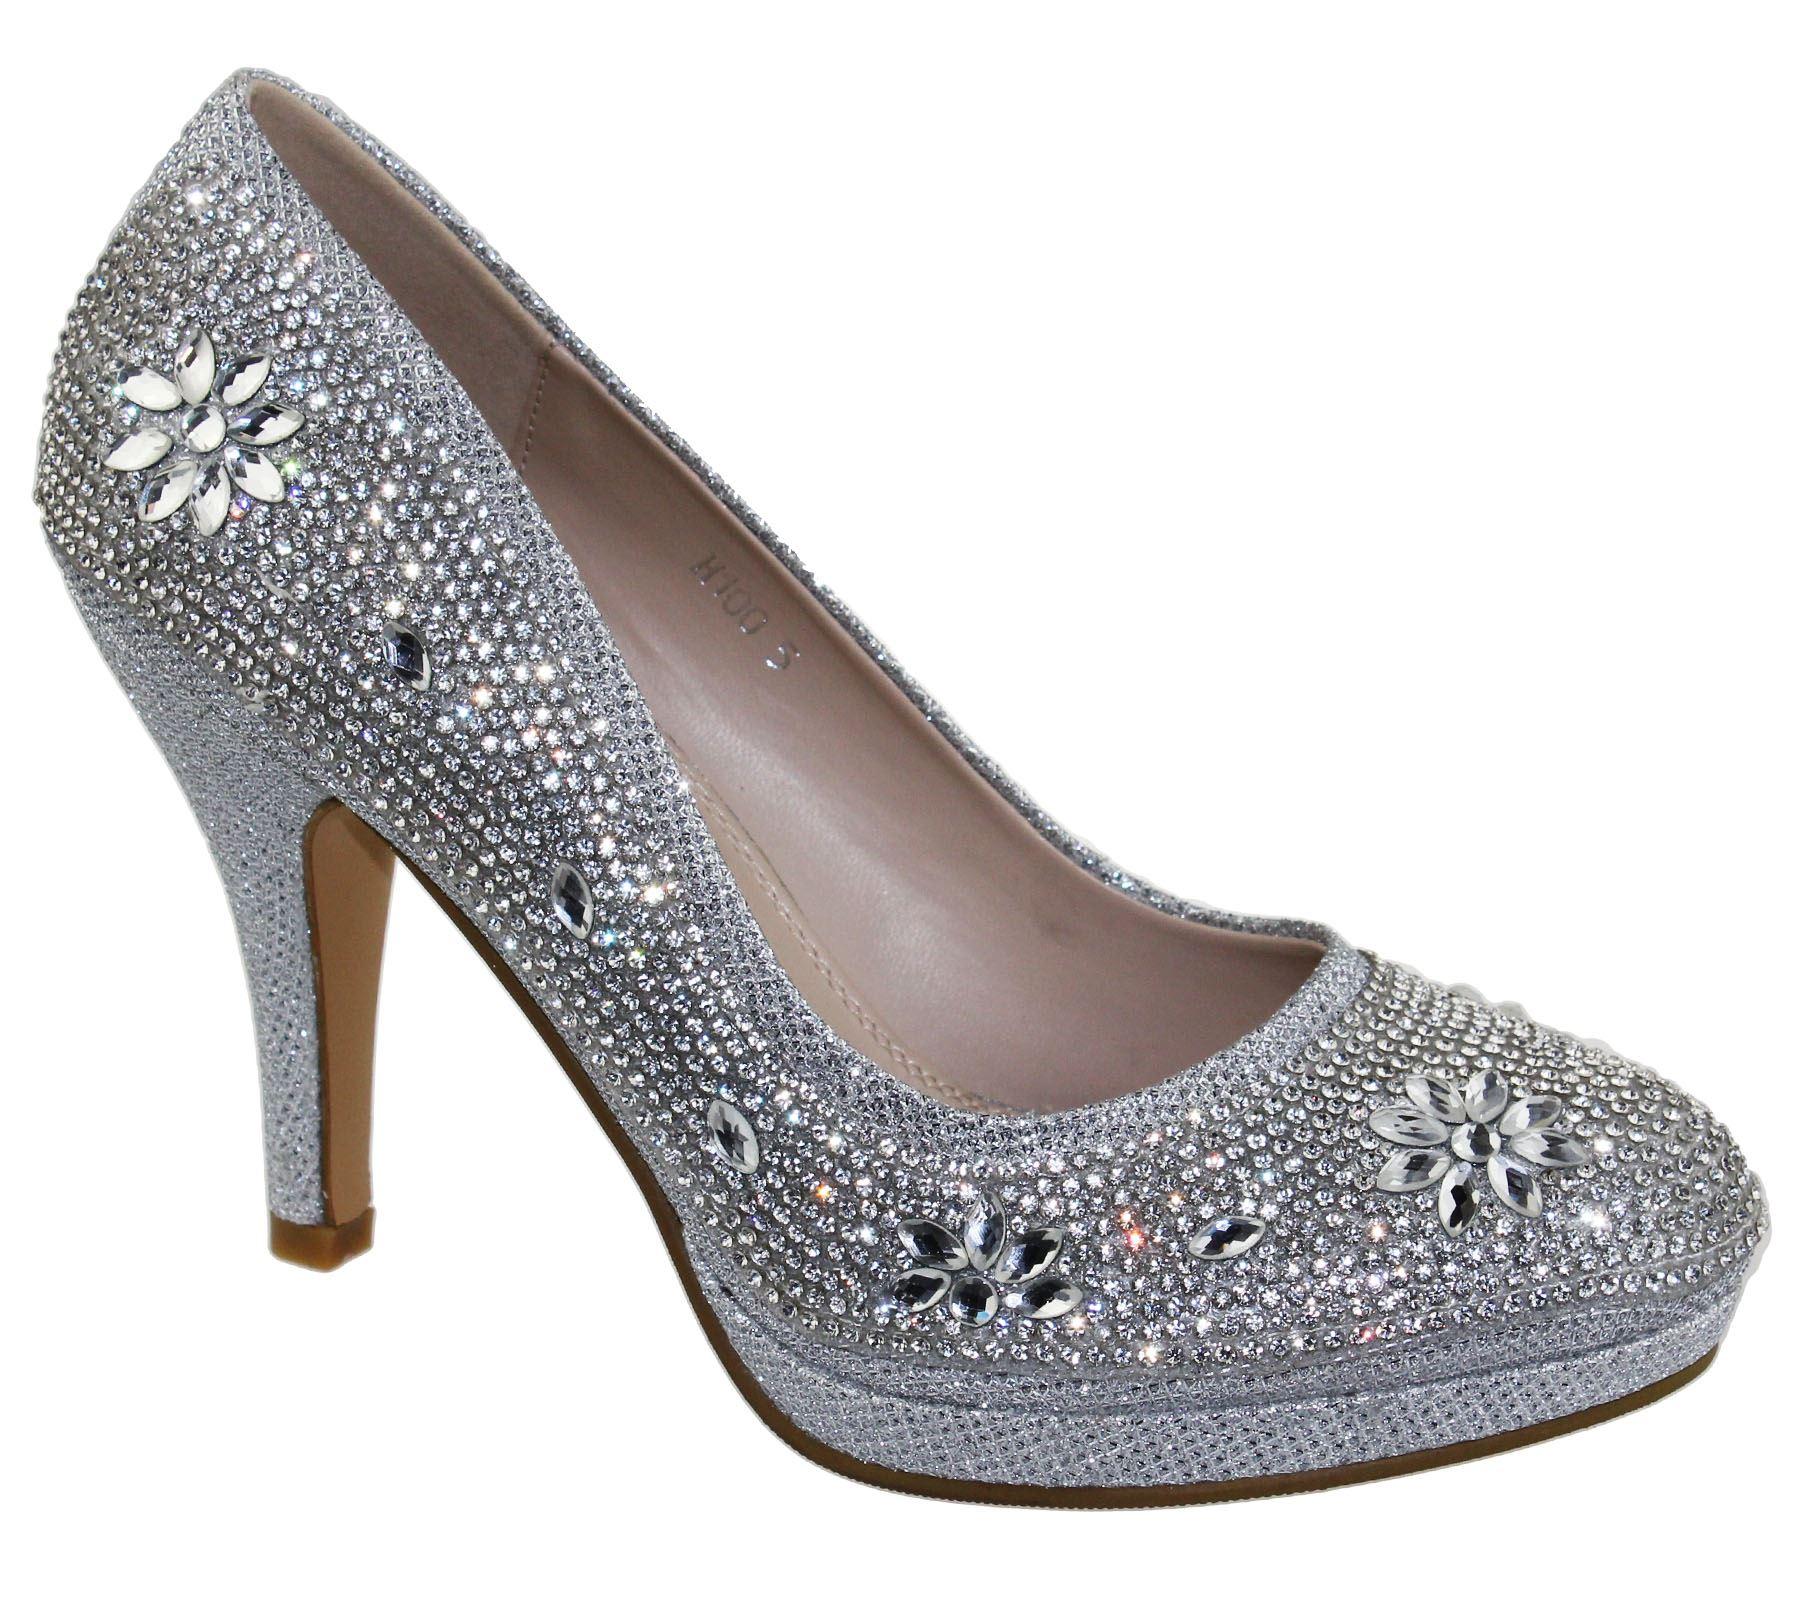 Womens-Platforms-High-Heels-Wedding-Bridal-Evening-Diamante-Ladies-Party-Shoes miniatura 12